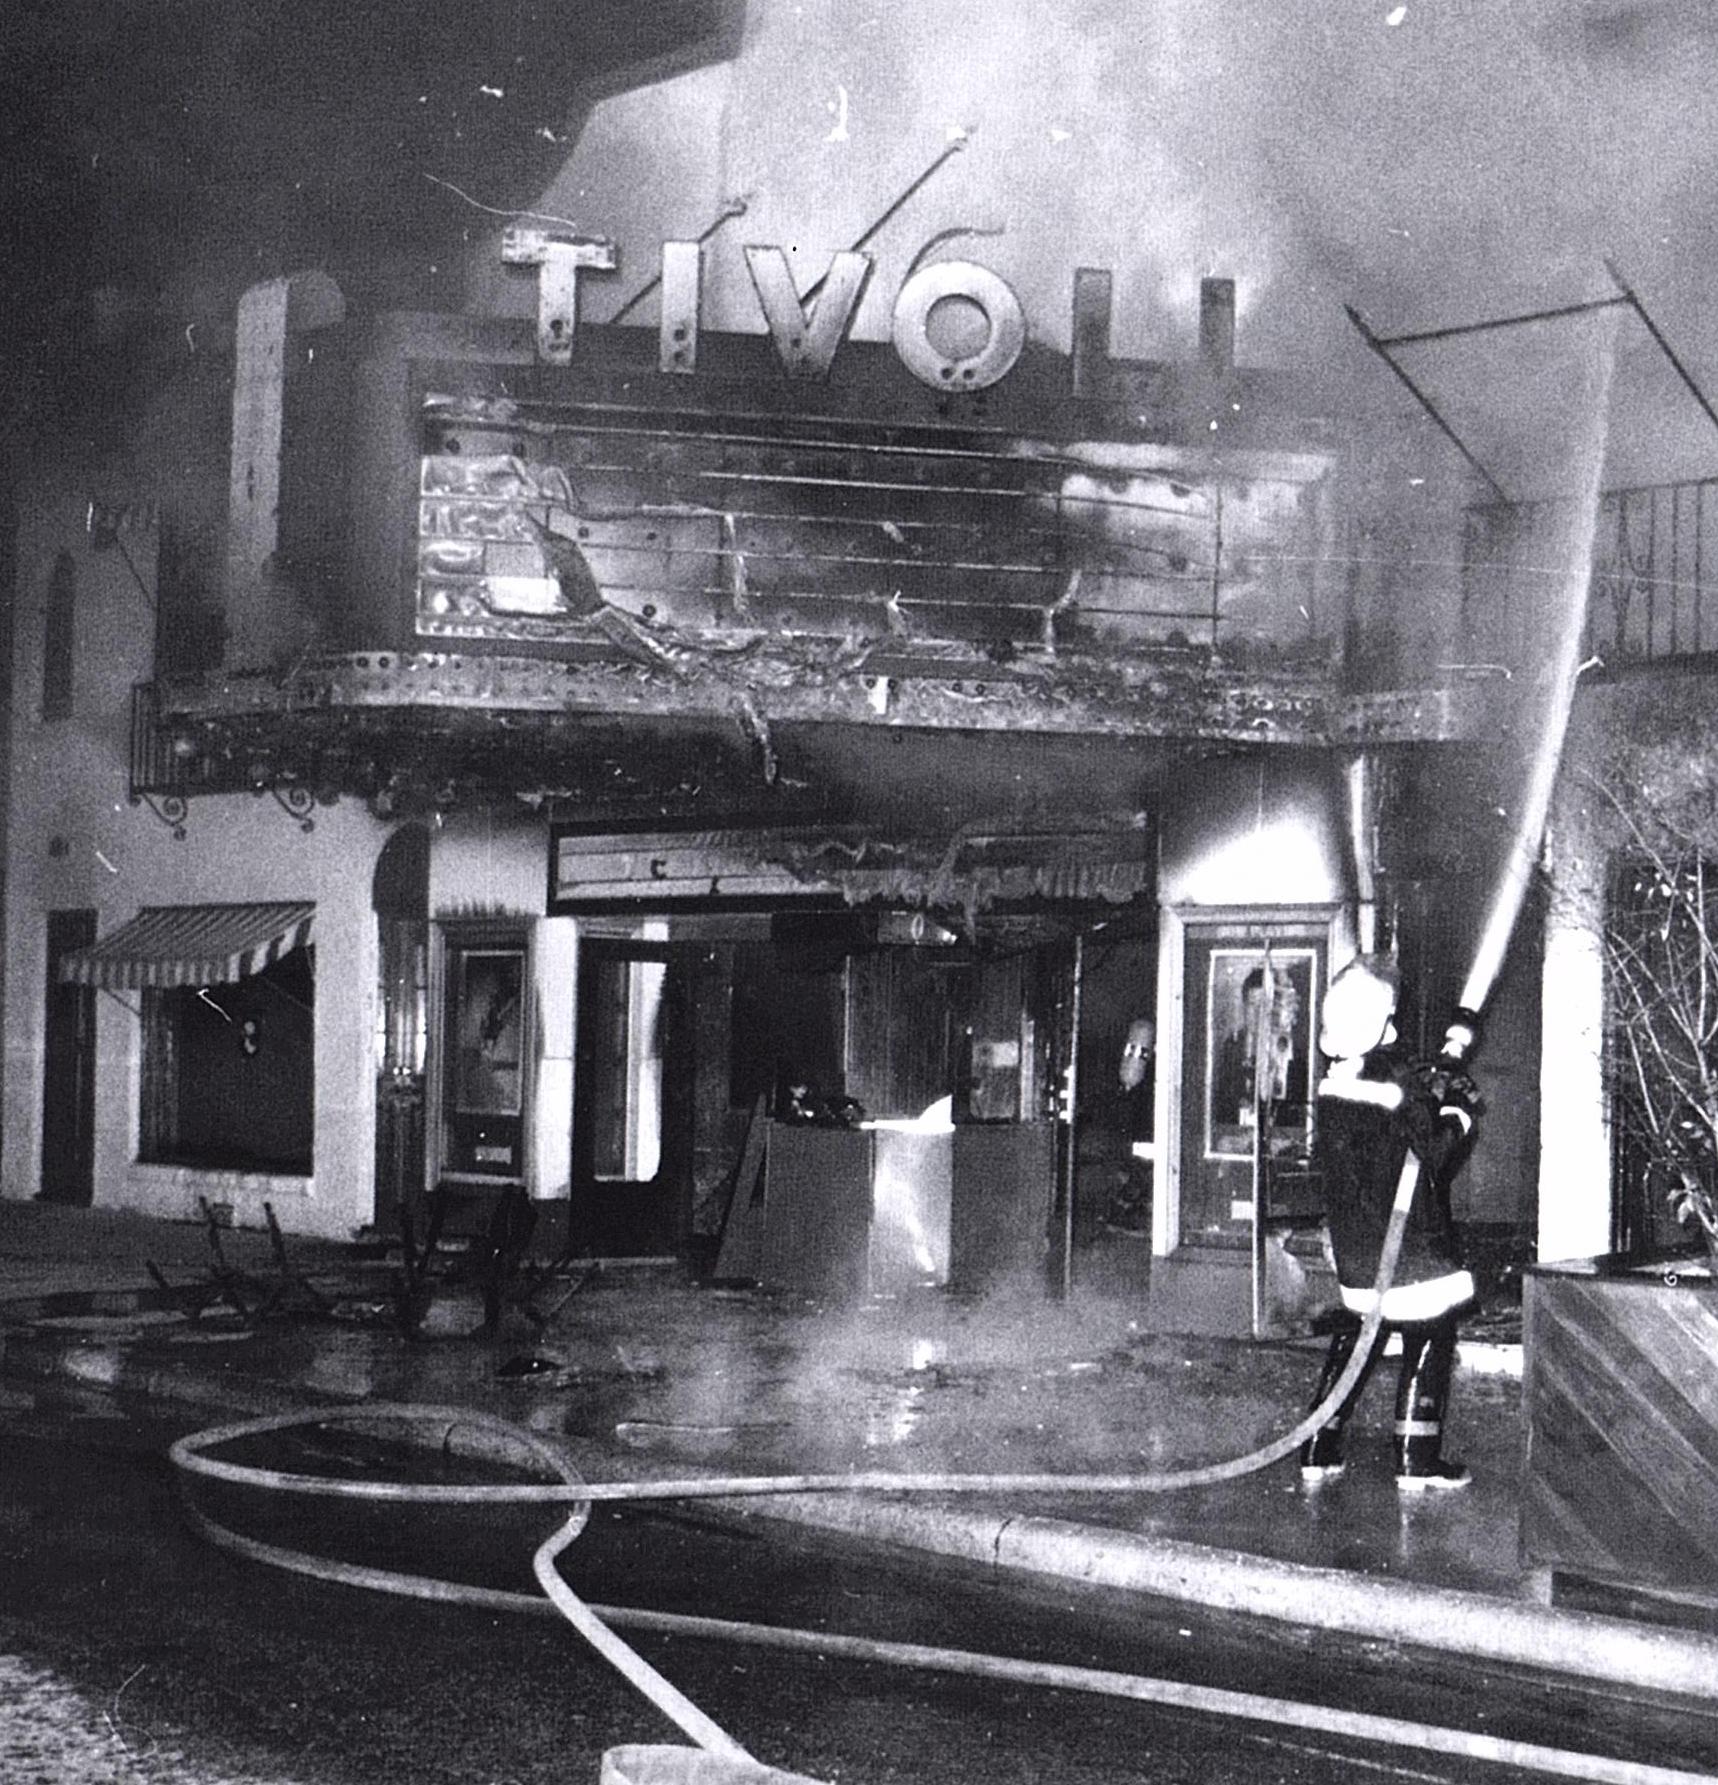 Tivoli Fire